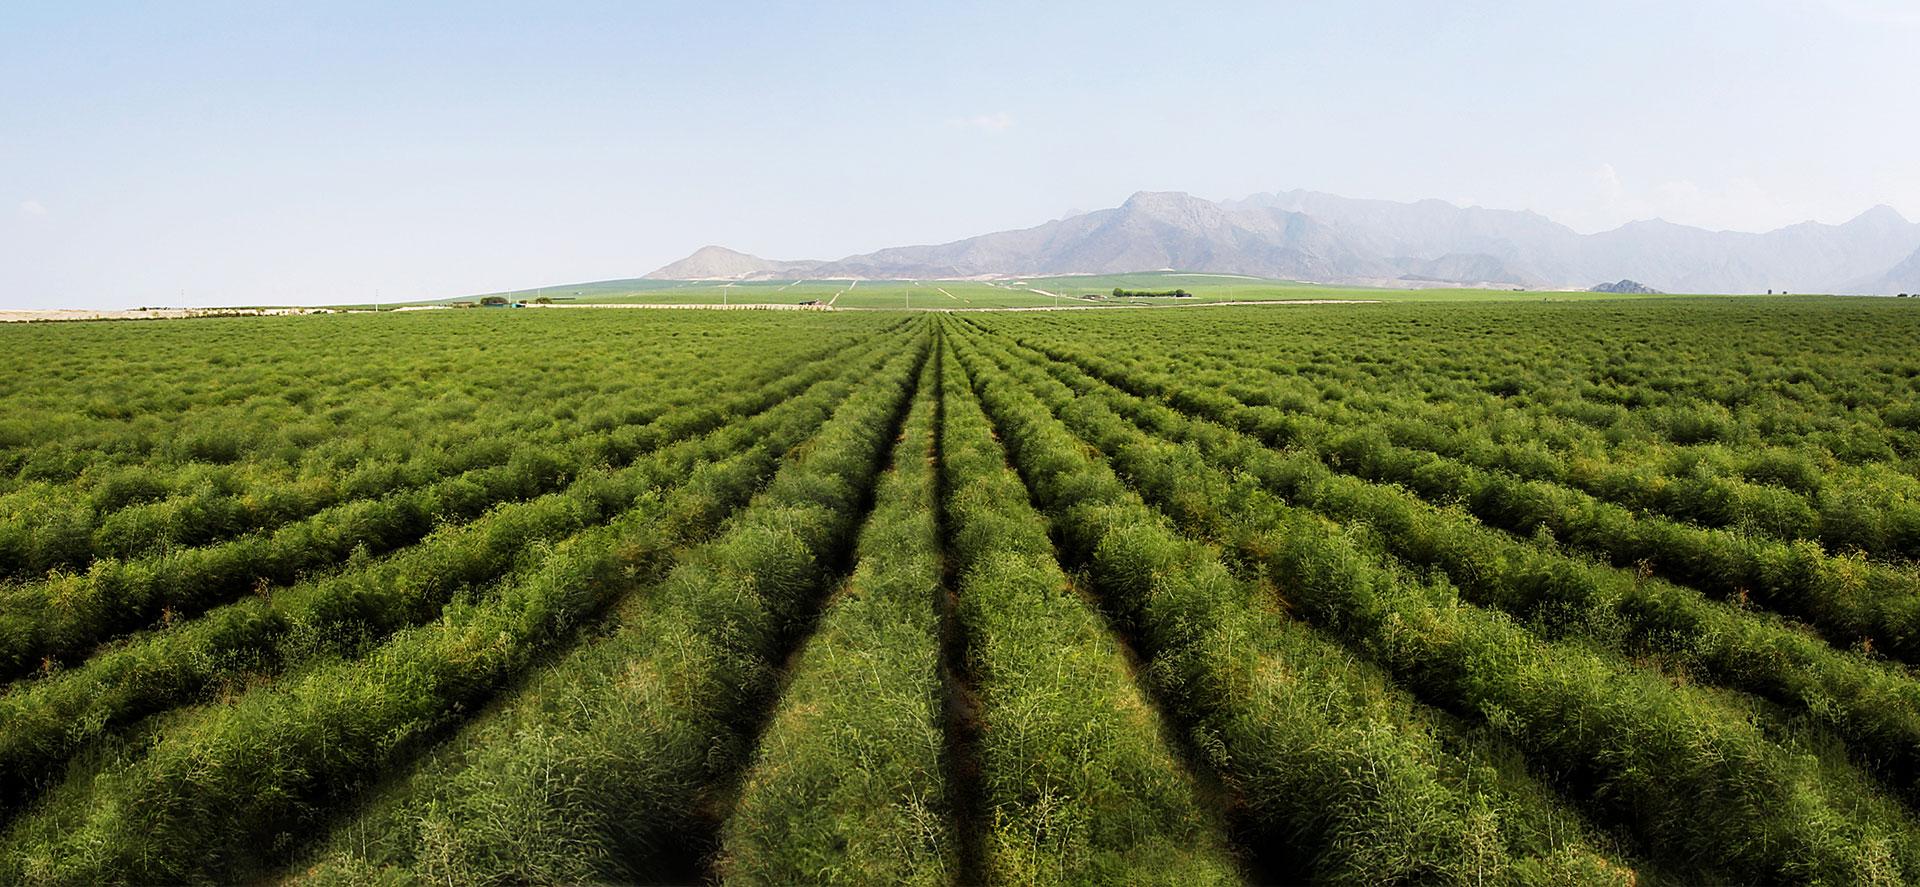 Fields of green asparagus | Virú Naturally ahead